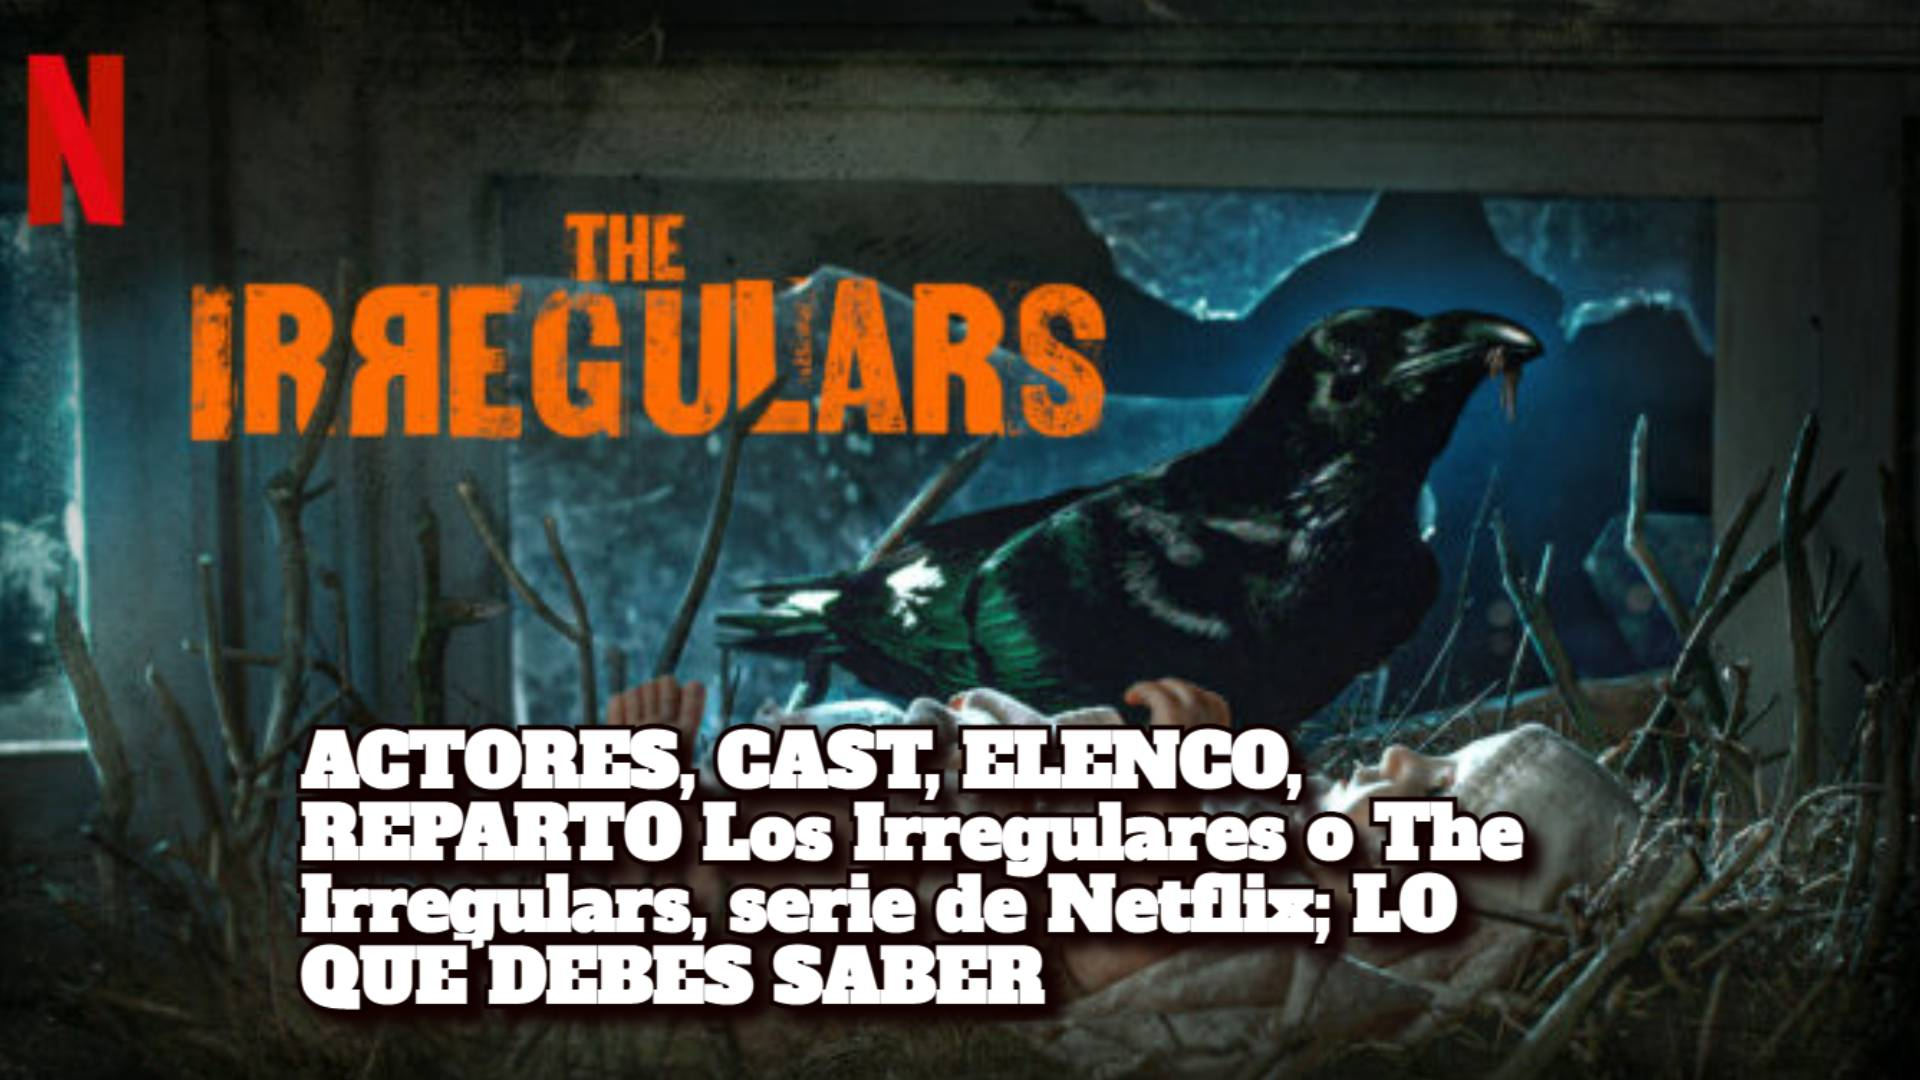 ACTORES, CAST, ELENCO, REPARTO Los Irregulares o The Irregulars